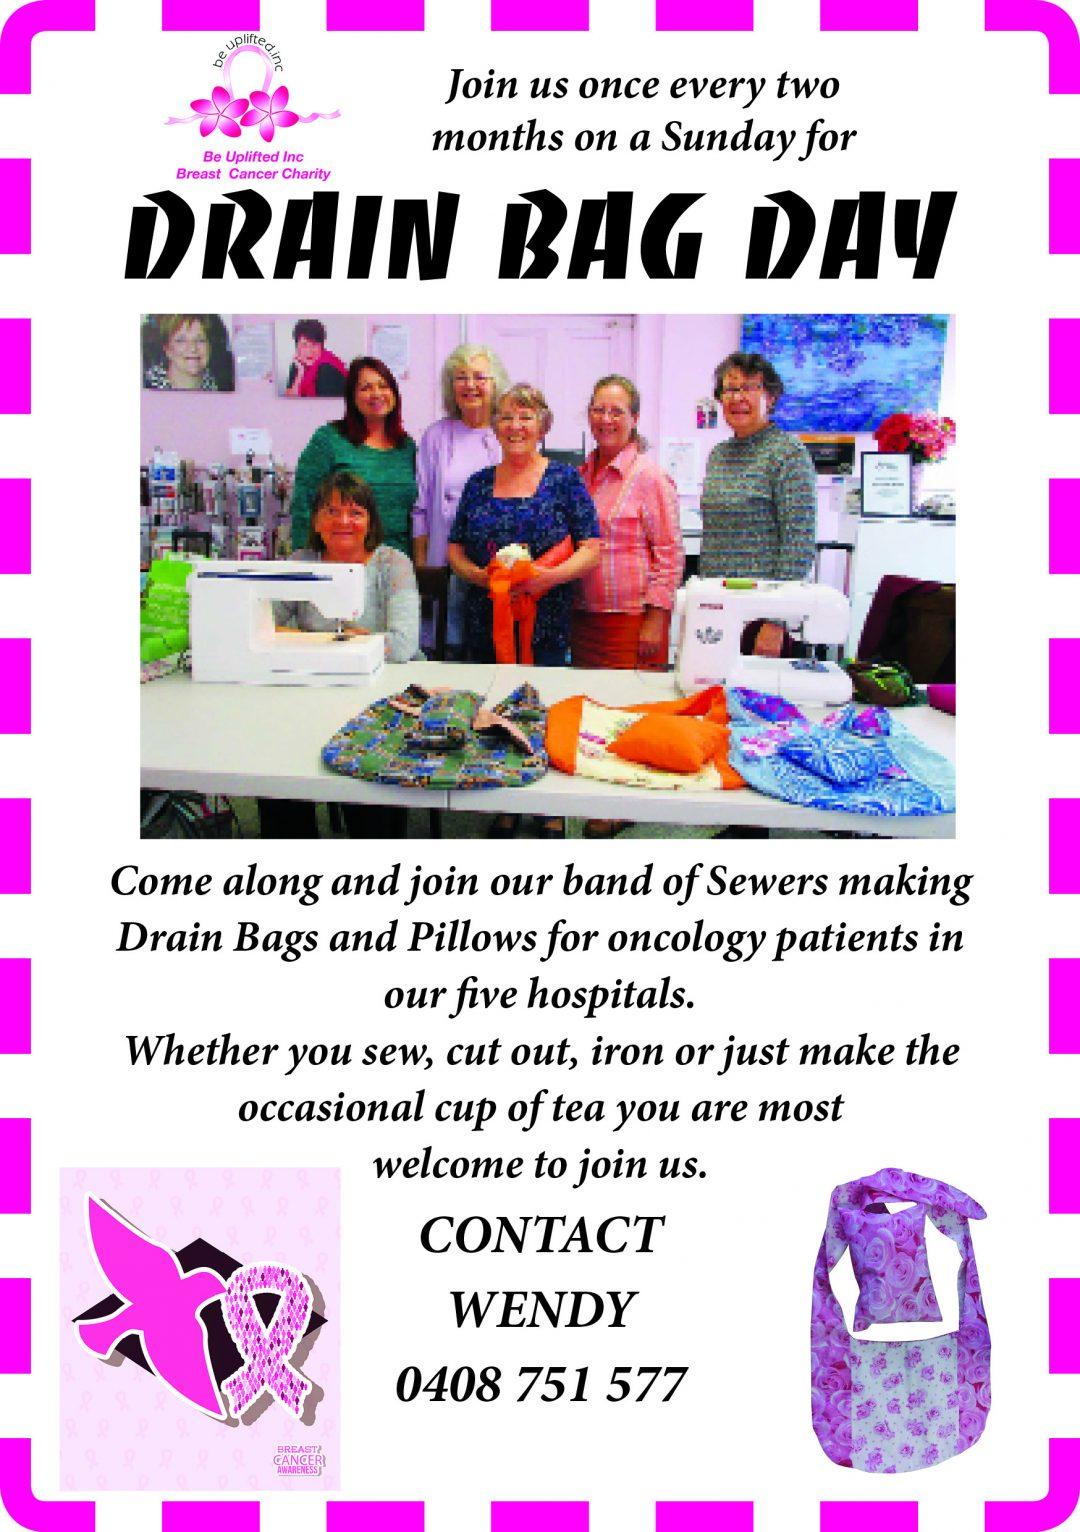 Drain Bag Day